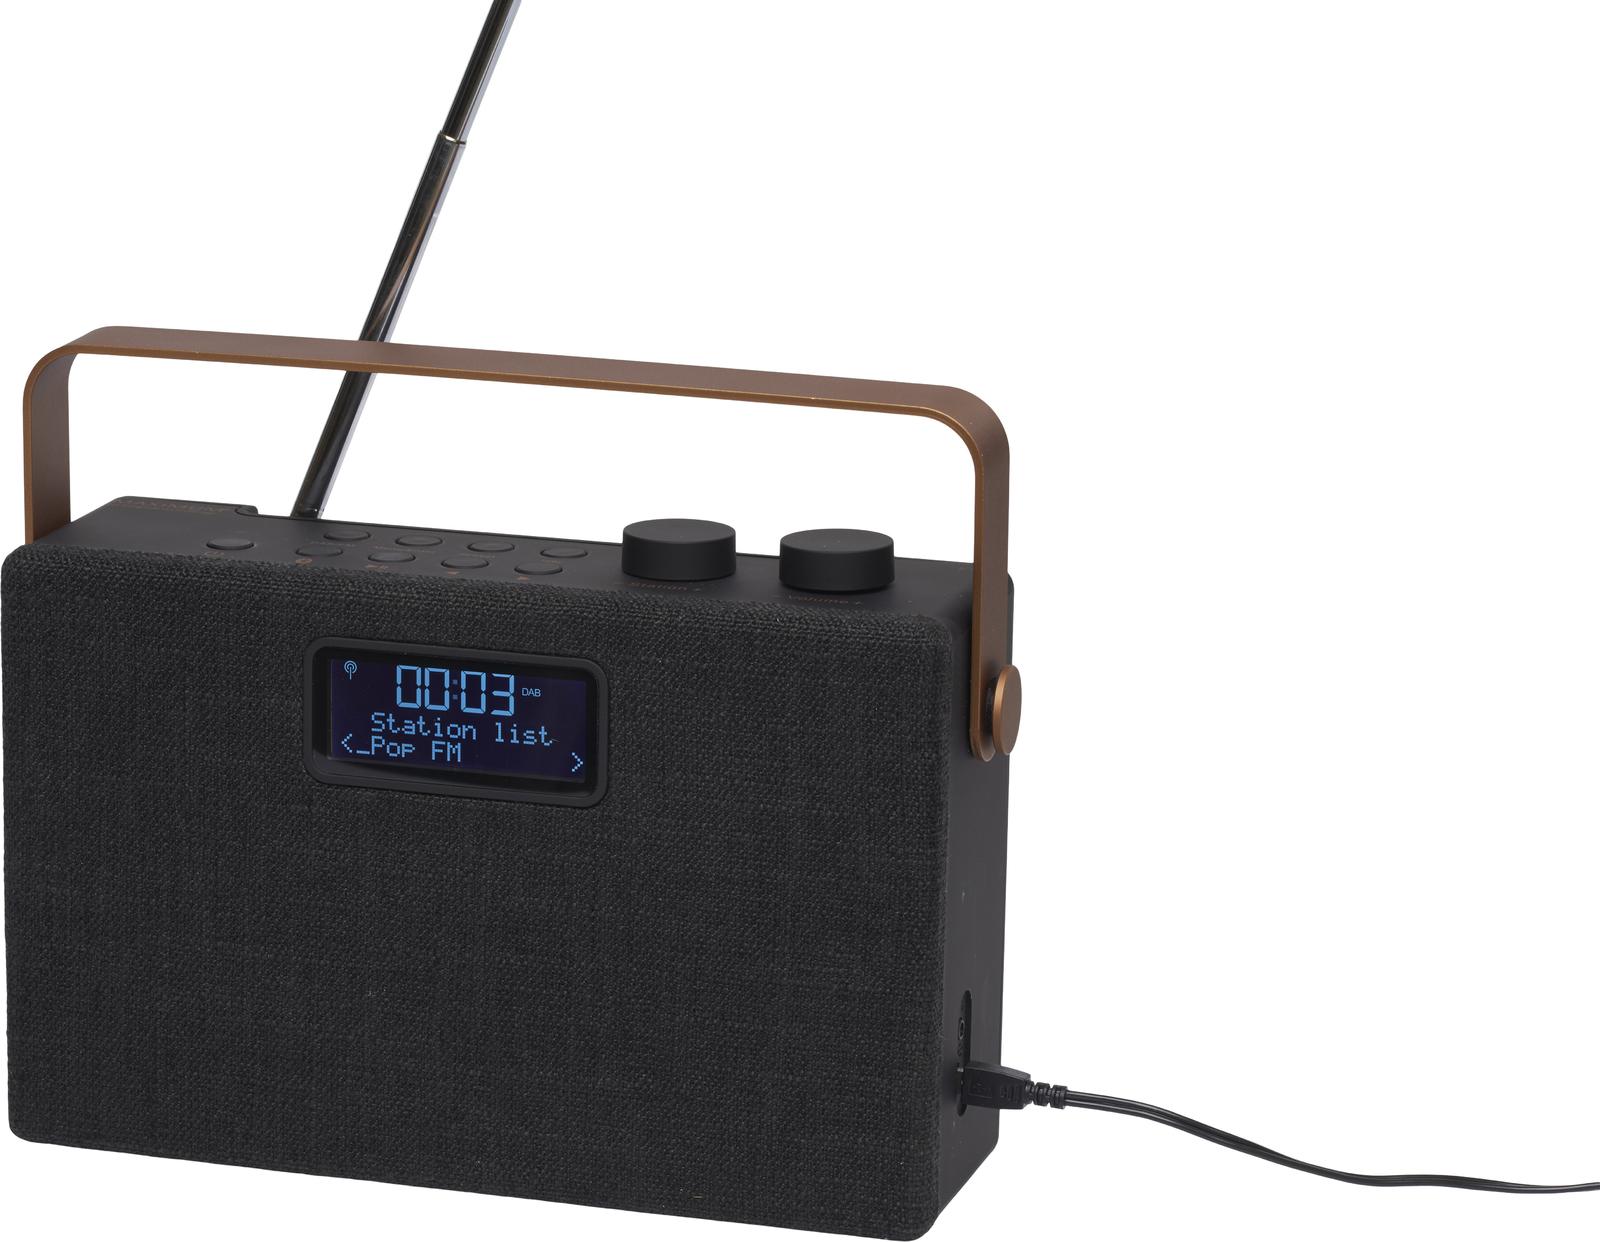 Dab radio maximum